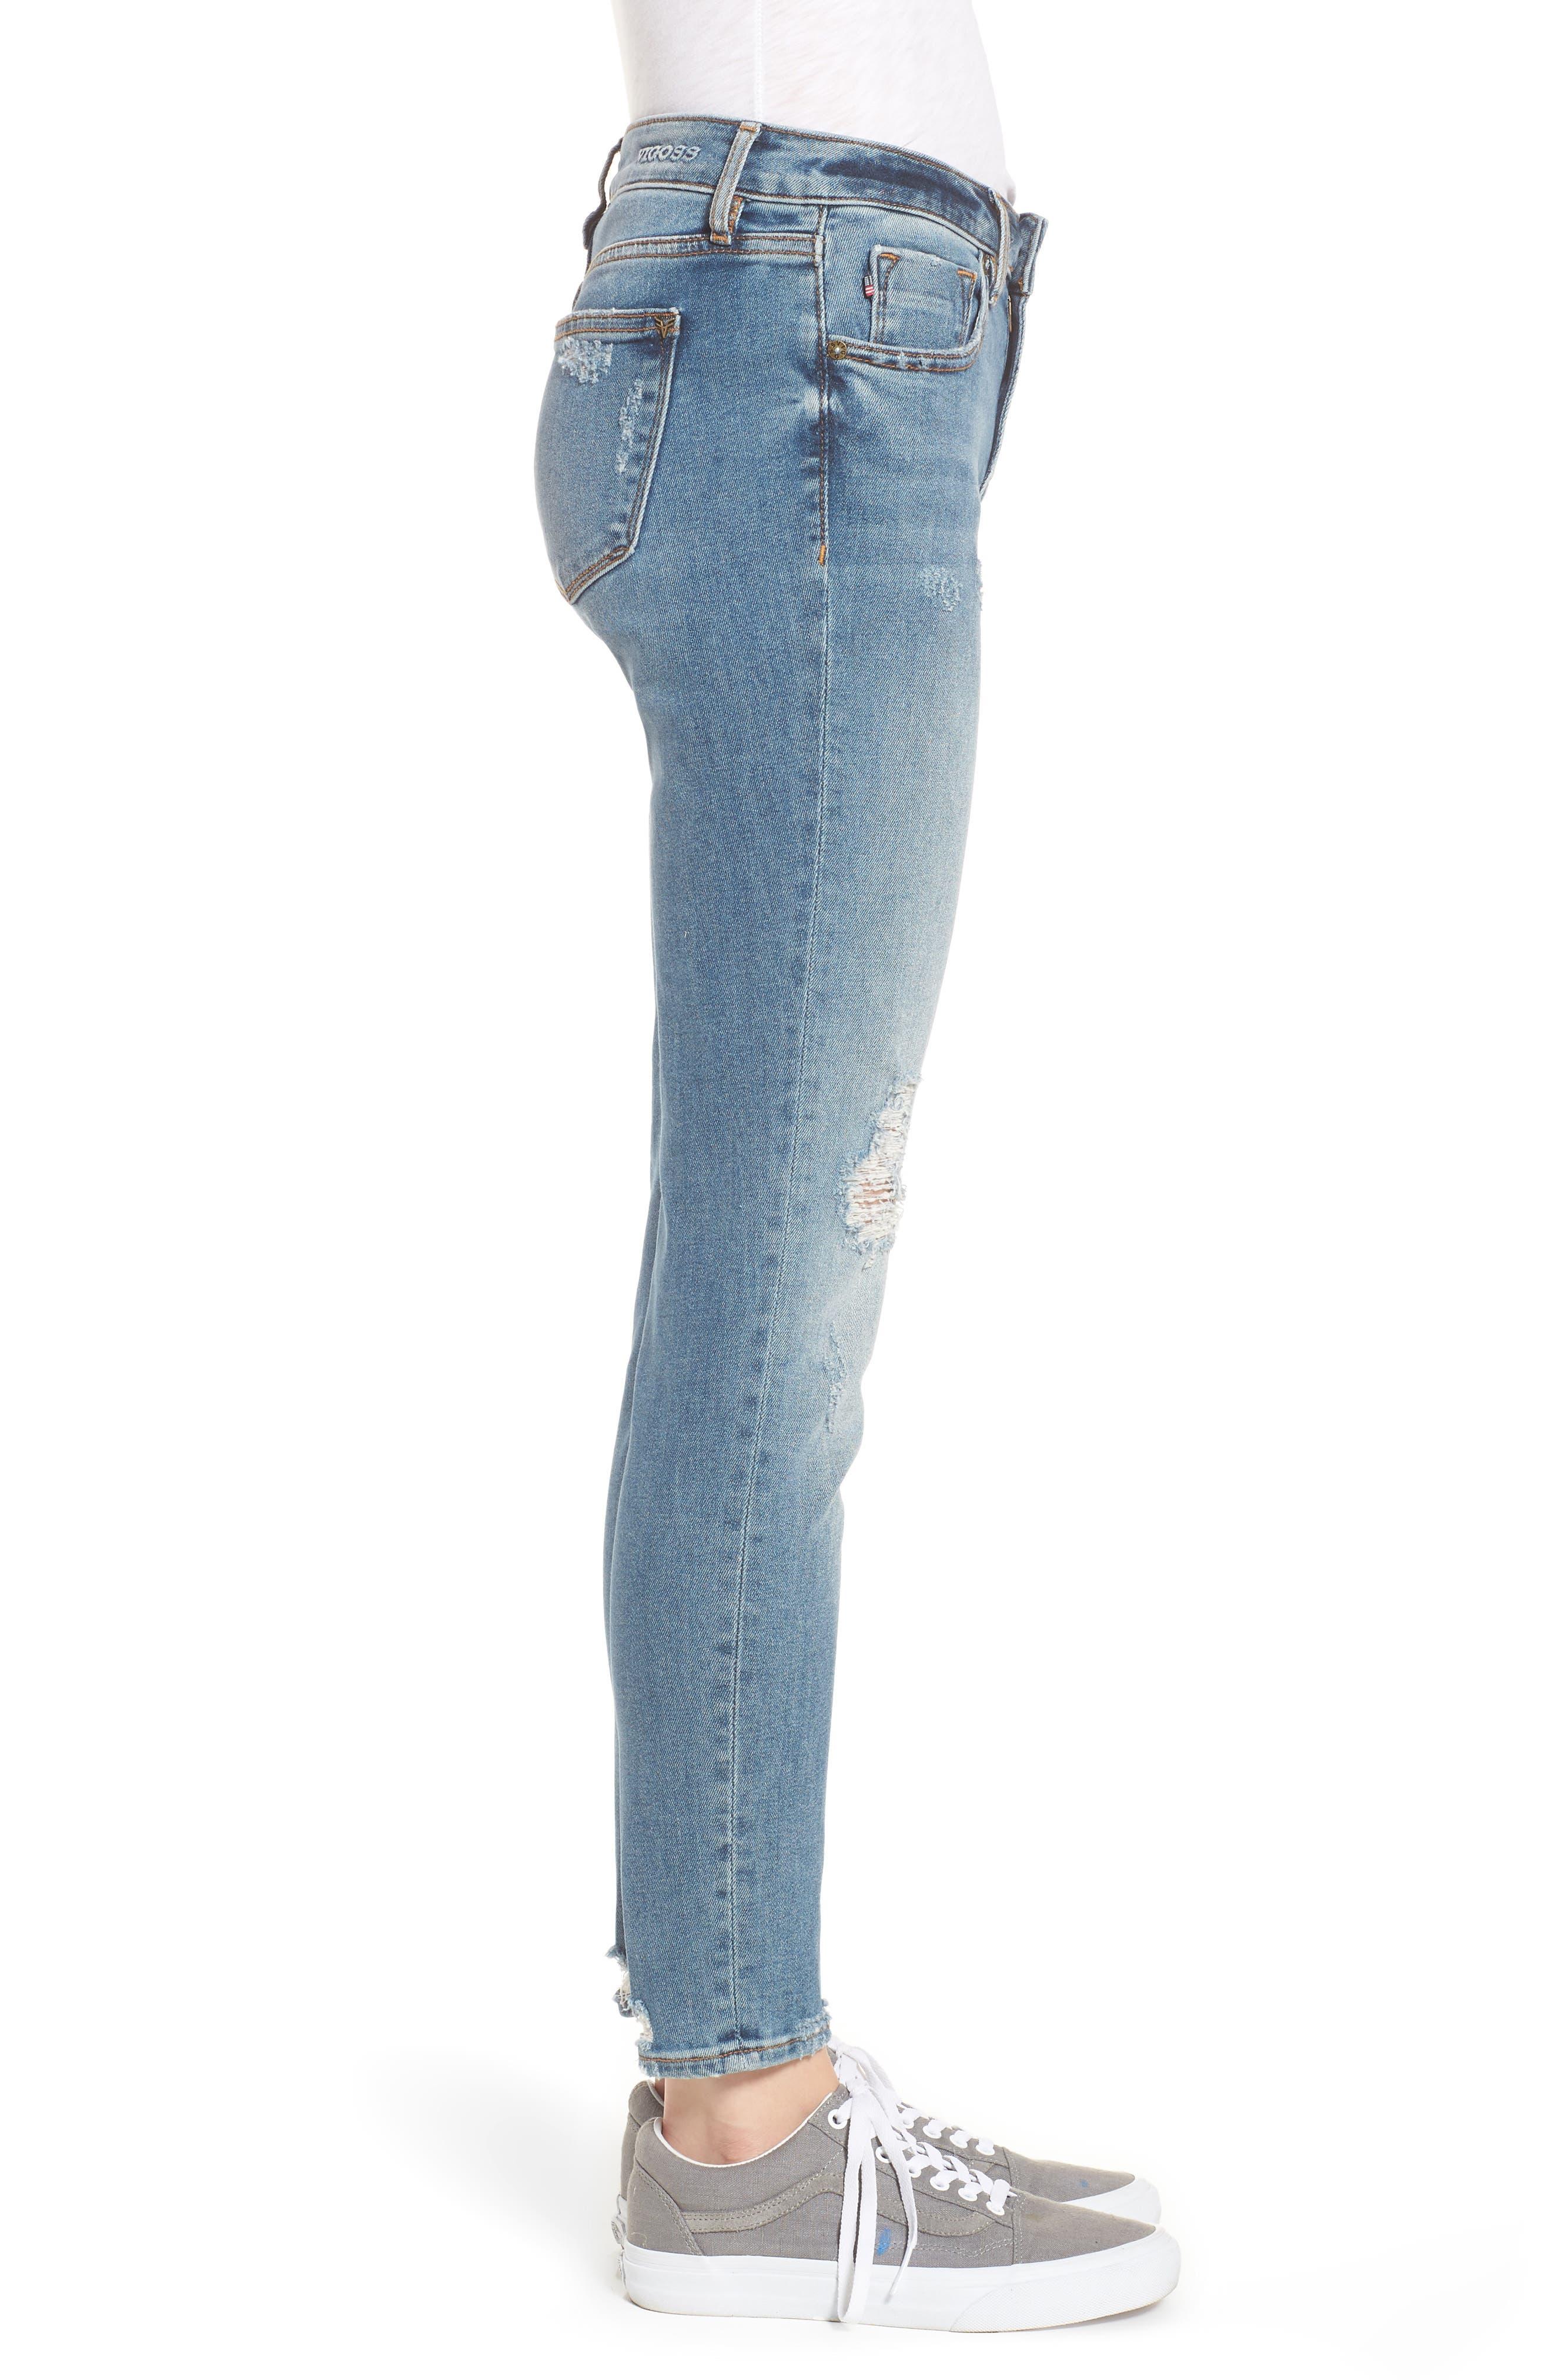 Jagger Decon Distressed Skinny Jeans,                             Alternate thumbnail 3, color,                             Medium Wash